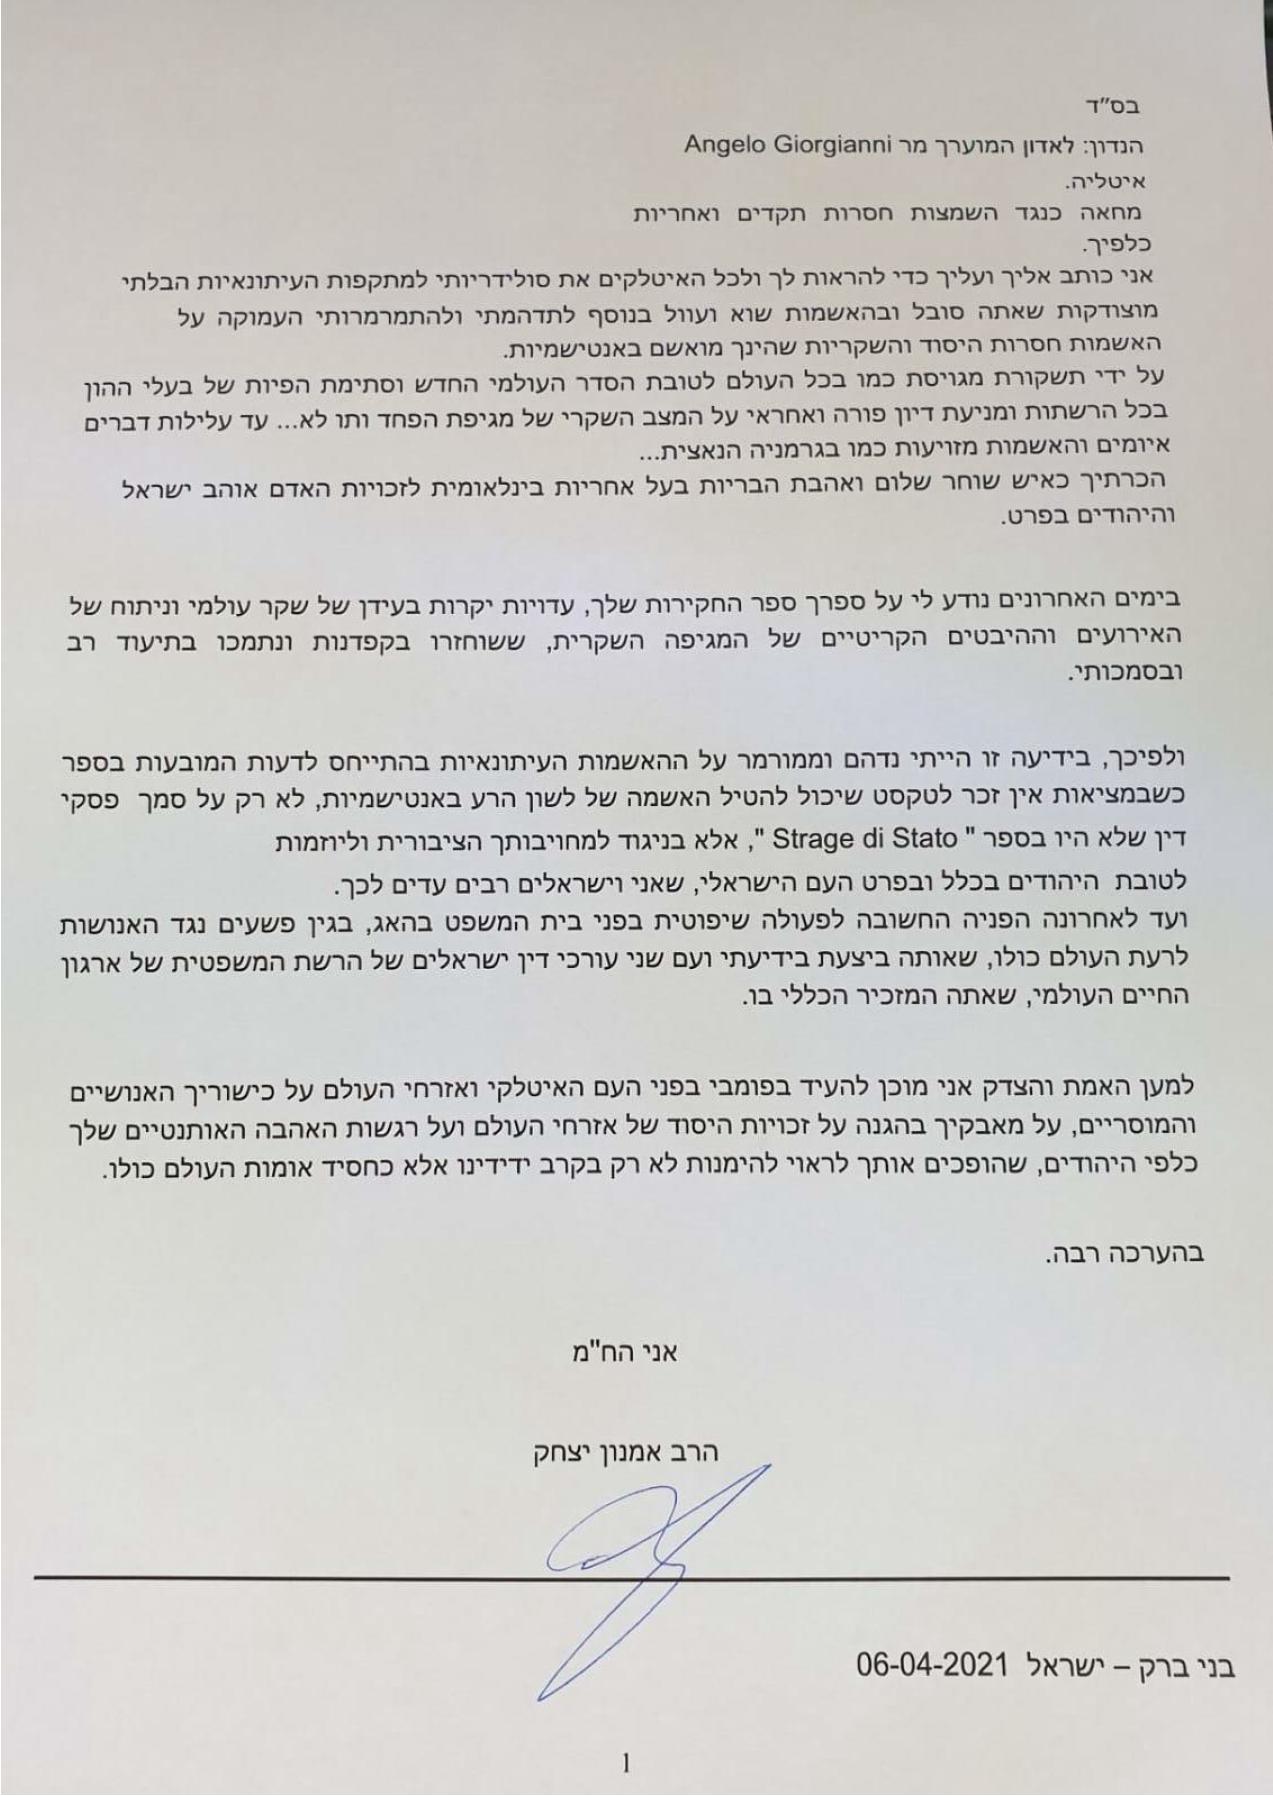 Lettre du rabbin Amnon Yitzhak (6 avril 2021)